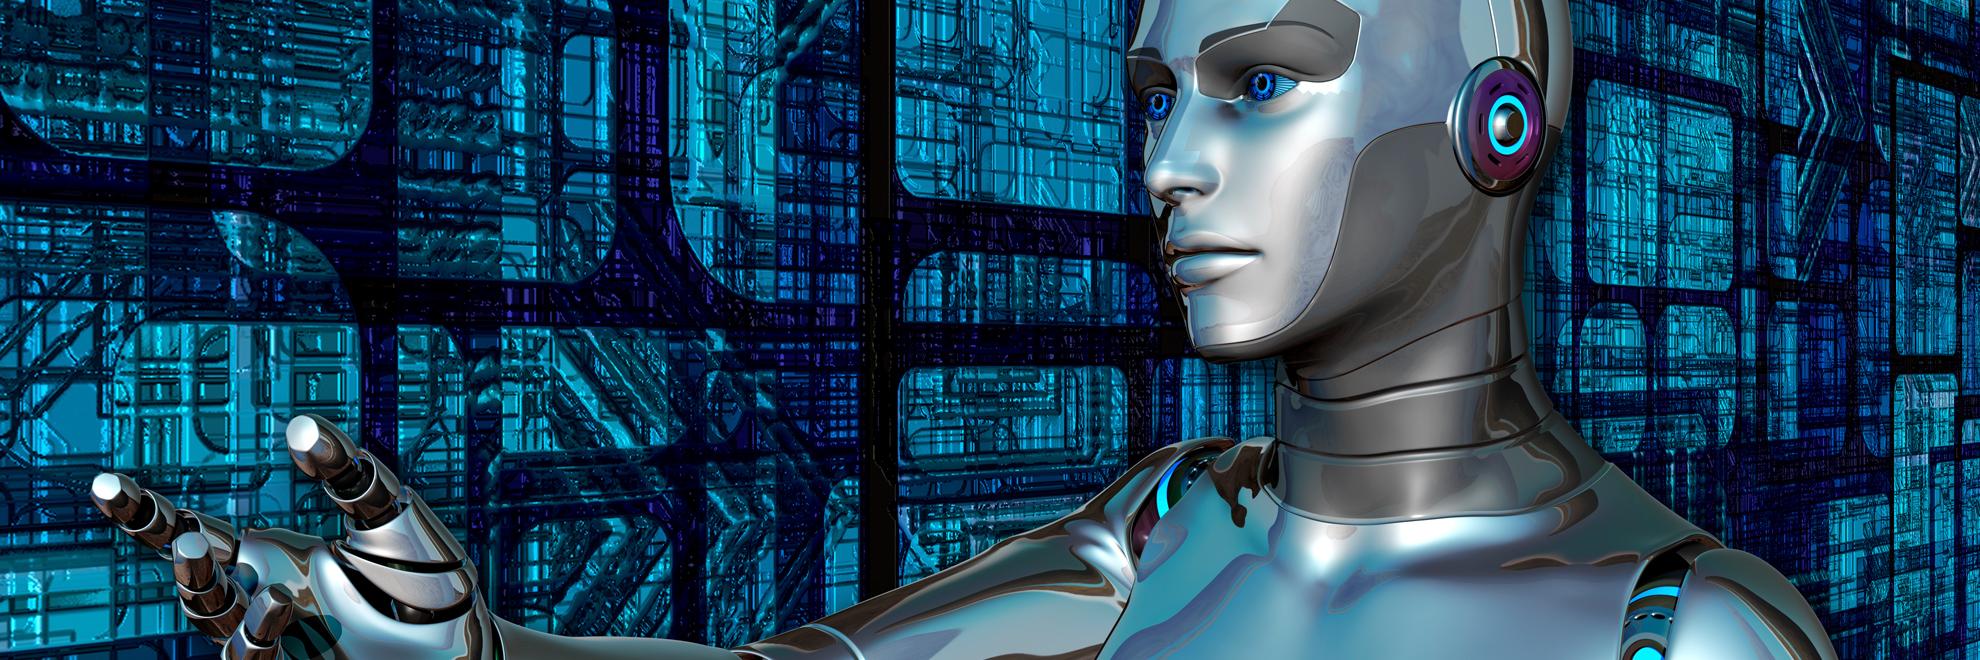 Big Data Meets Artificial Intelligence Part 1